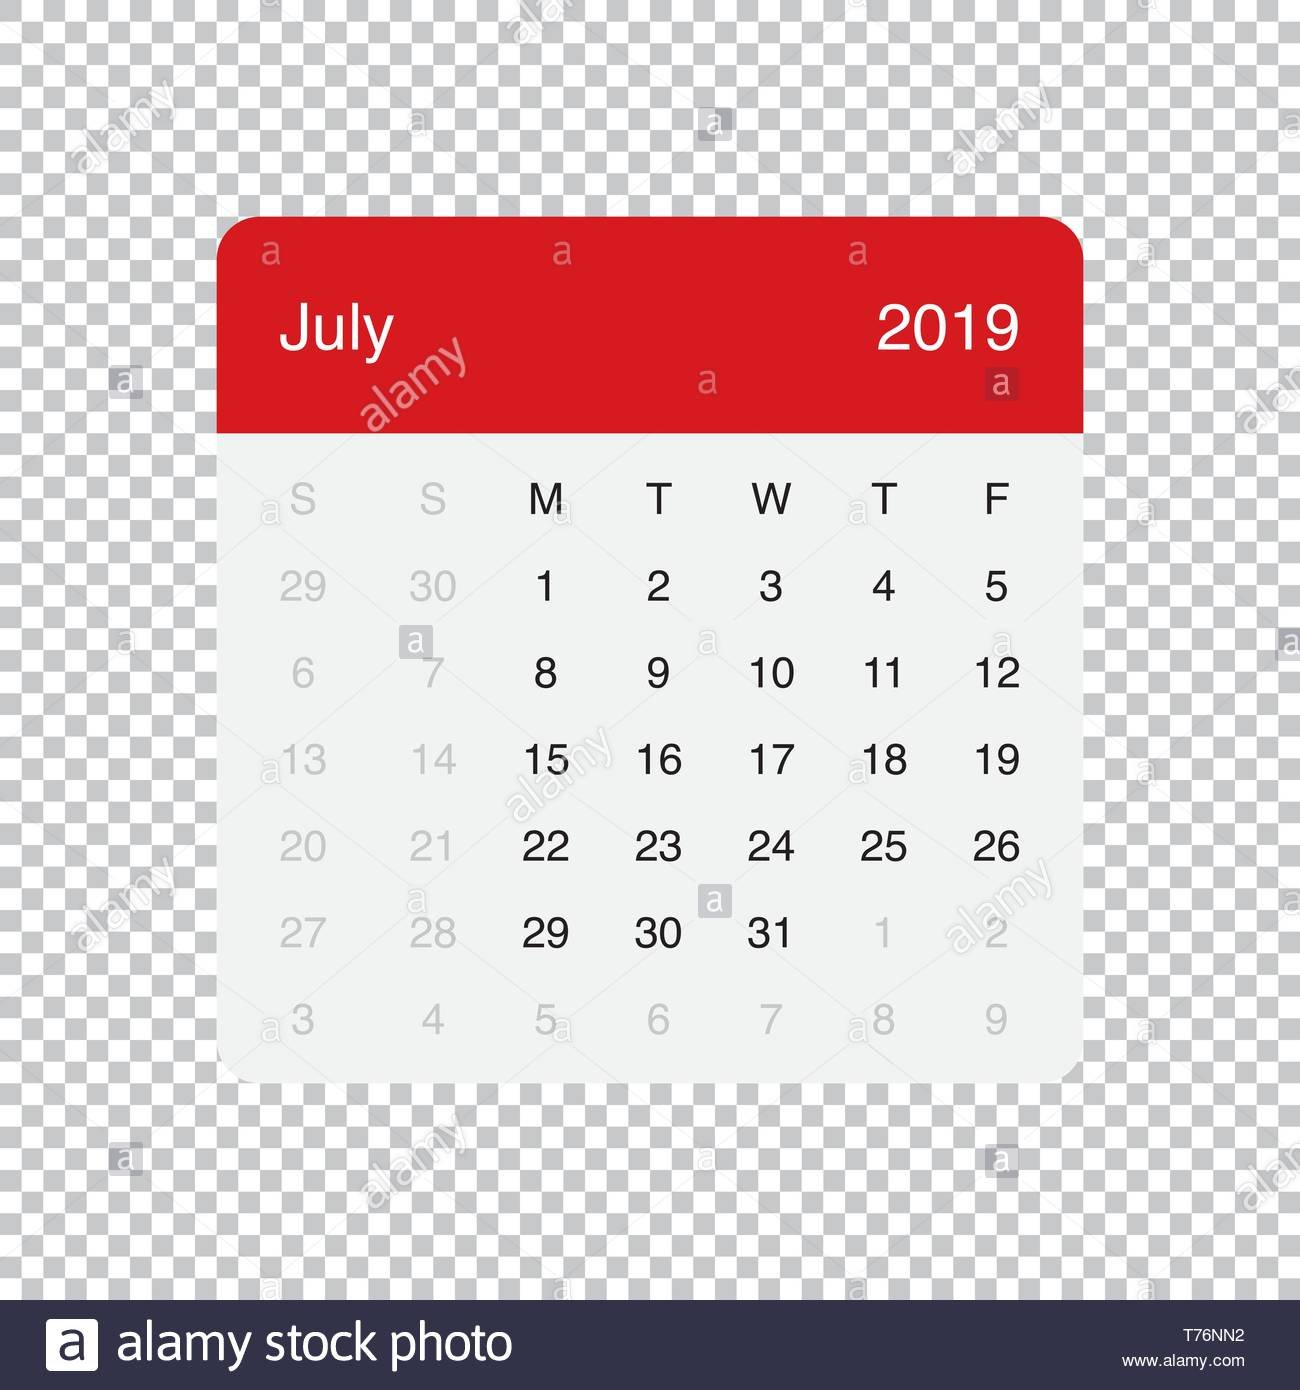 July 2019 Calendar Stock Photos & July 2019 Calendar Stock Images July 8 2019 Calendar